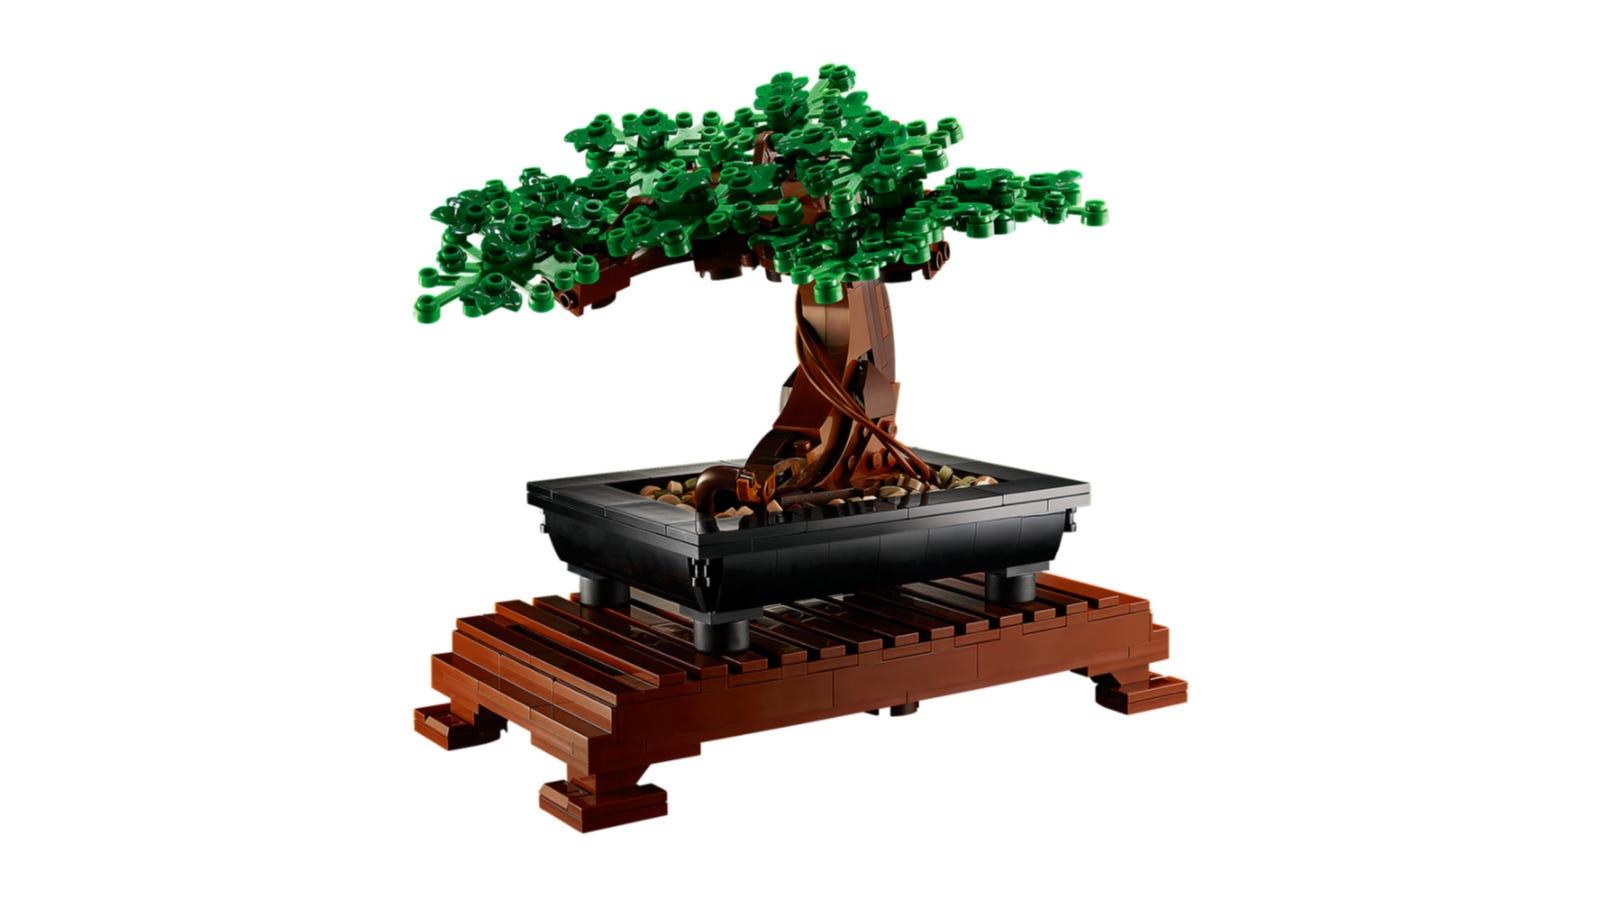 LEGO Creator Expert Bonsai Tree set